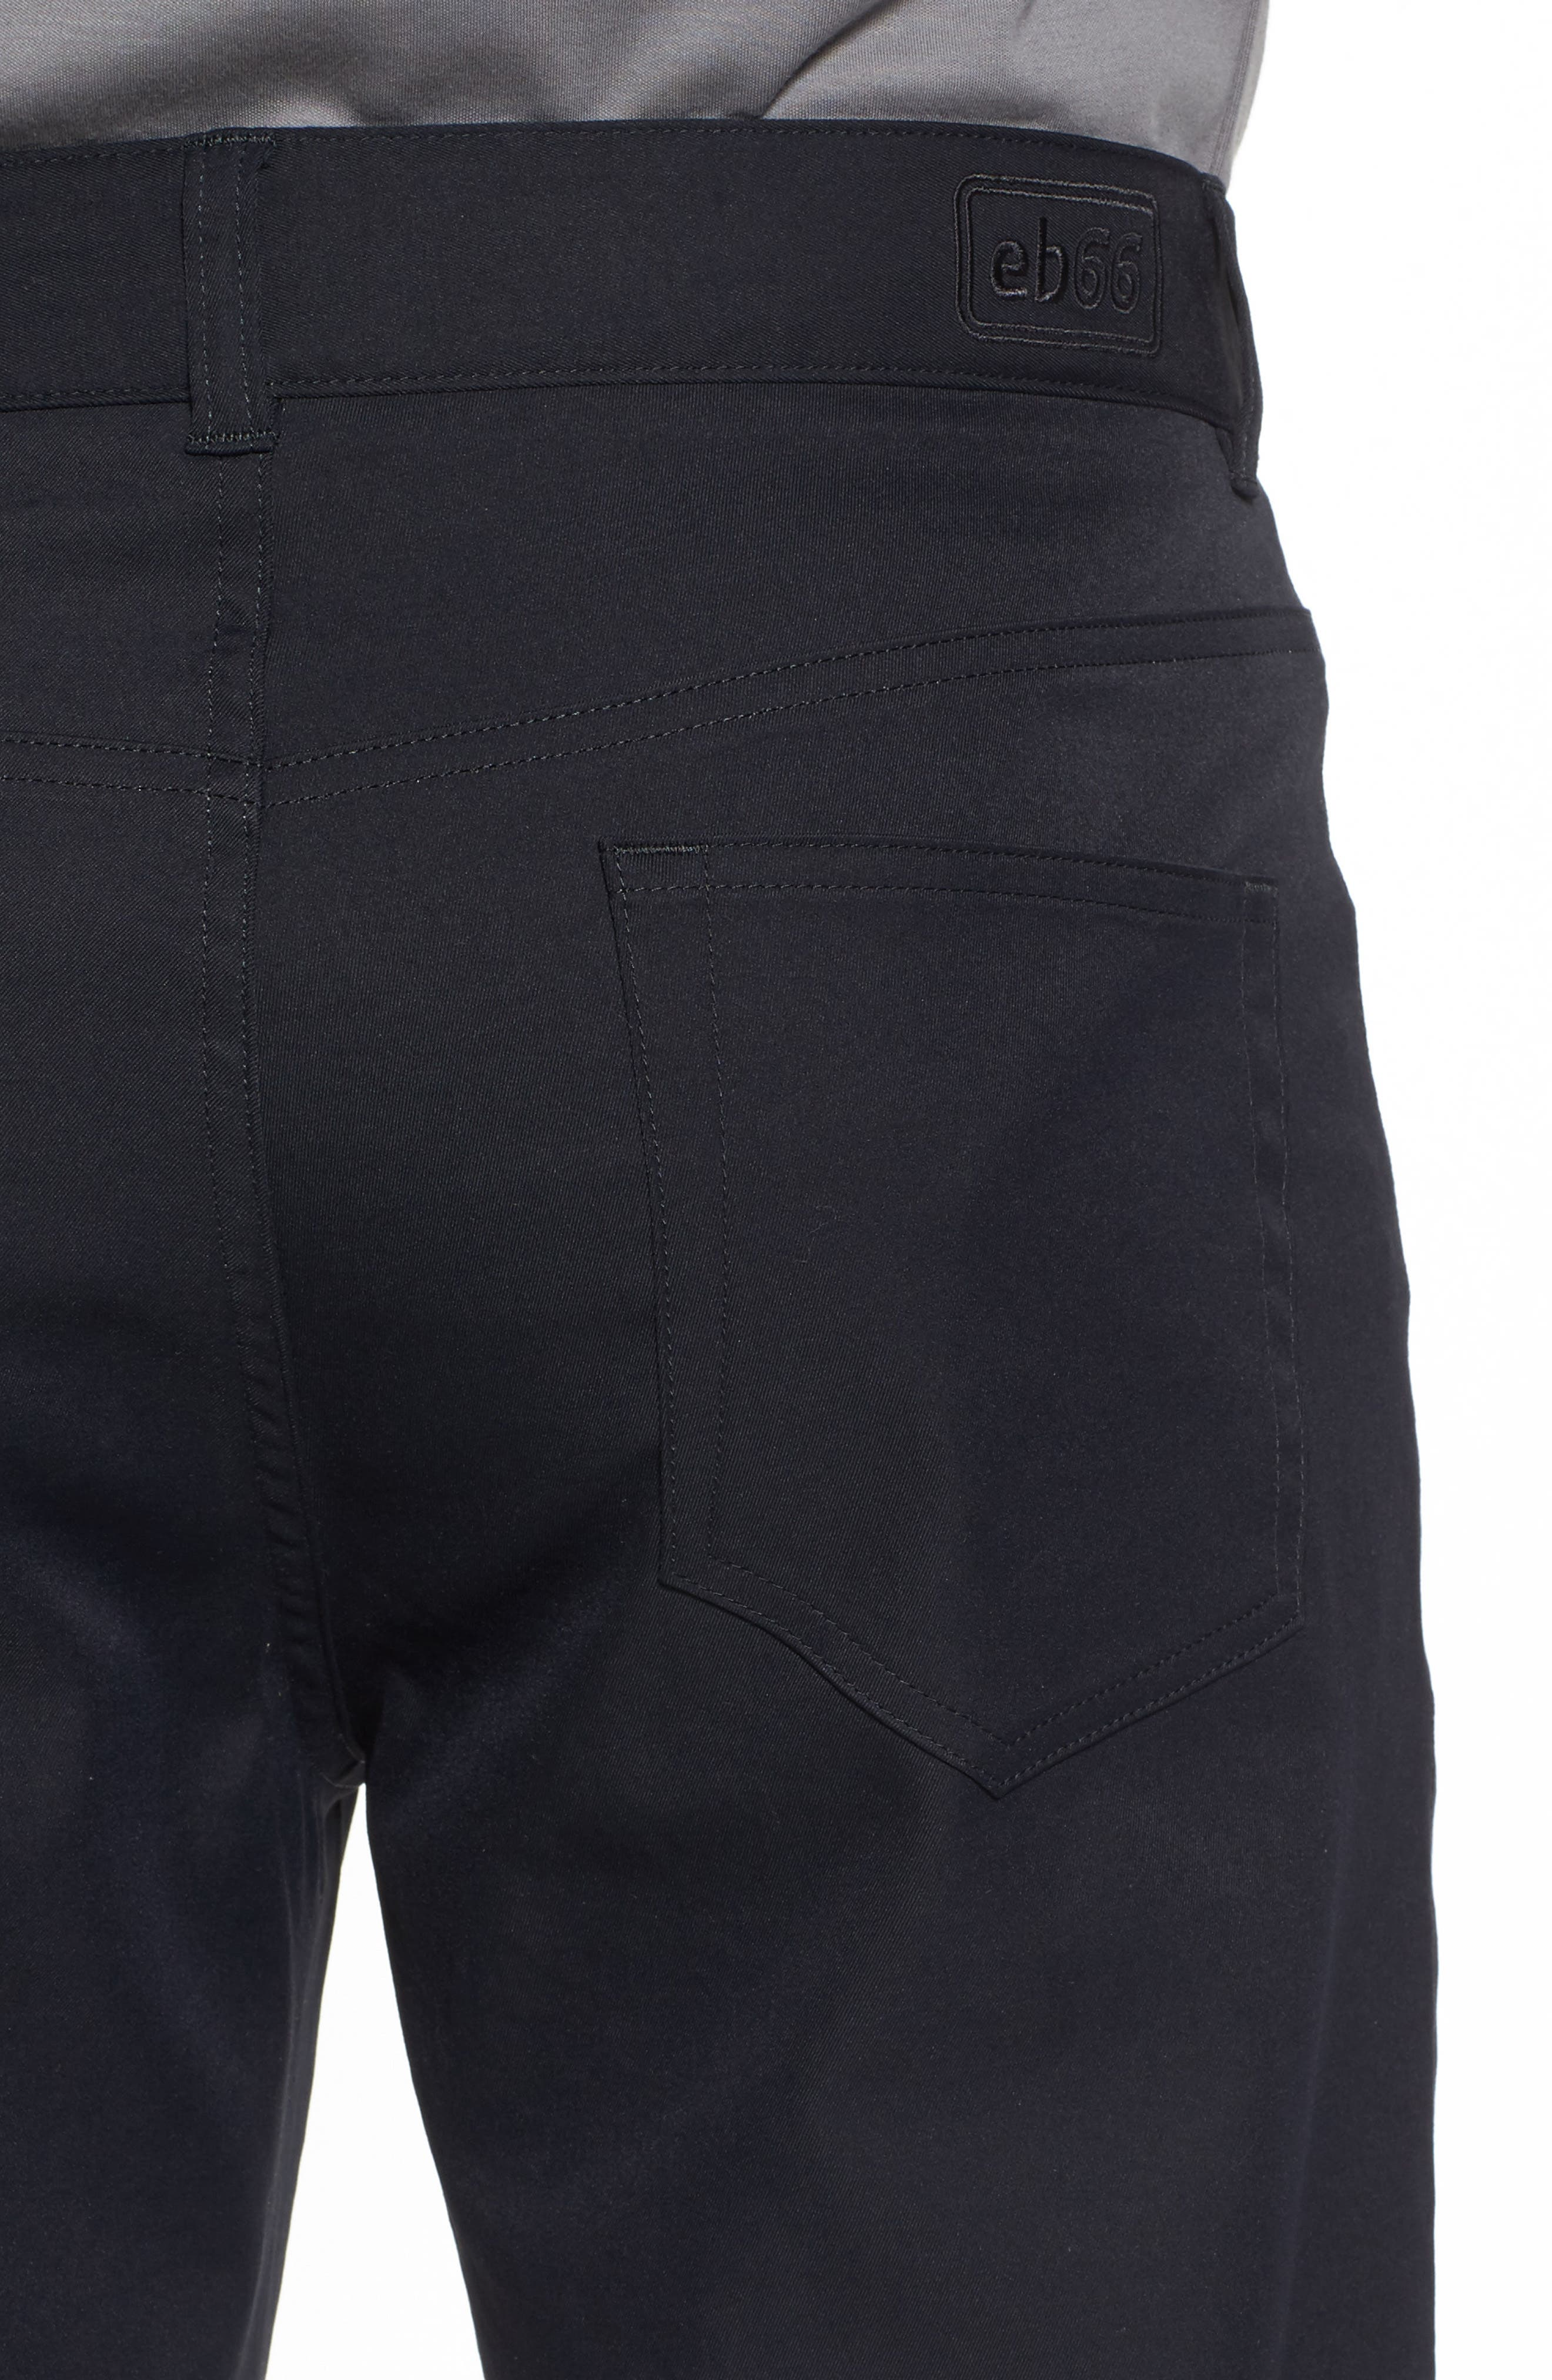 EB66 Performance Six-Pocket Pants,                             Alternate thumbnail 4, color,                             001